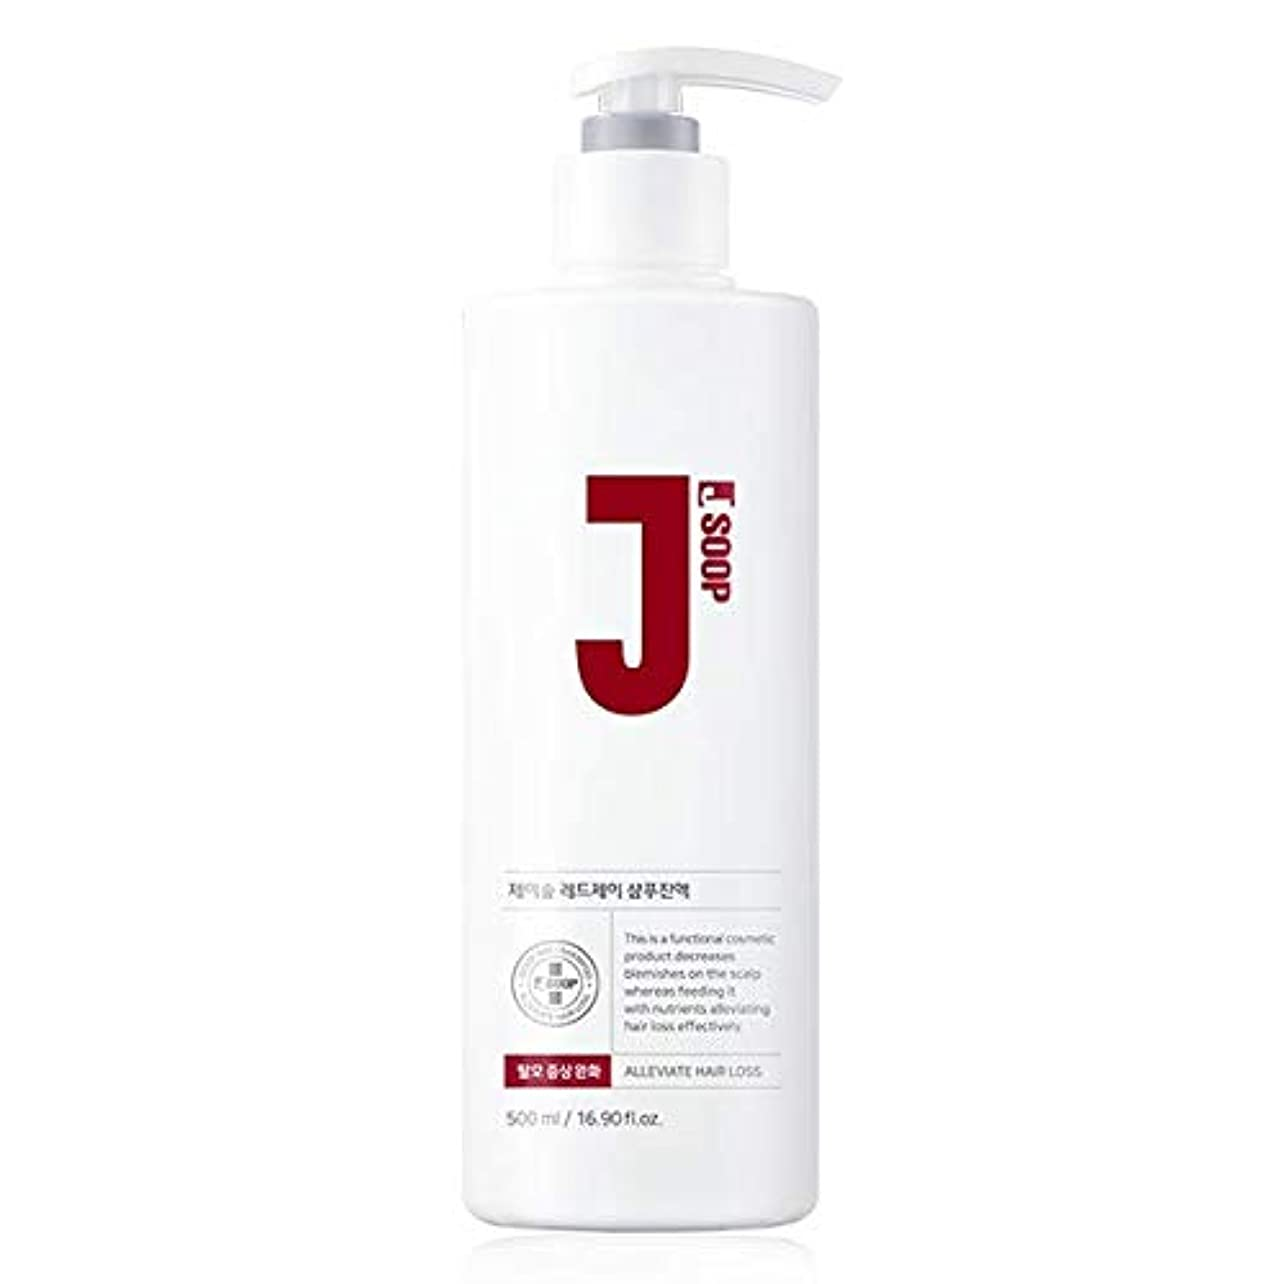 JSOOP レッドJ シャンプー / 抜け毛の悩みに / Red J Shampoo (500ml) [並行輸入品]